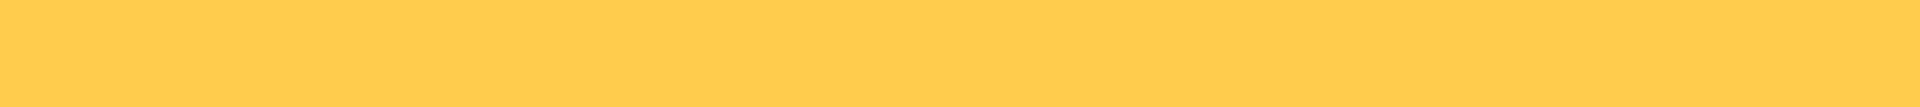 sep-yellow-bottom